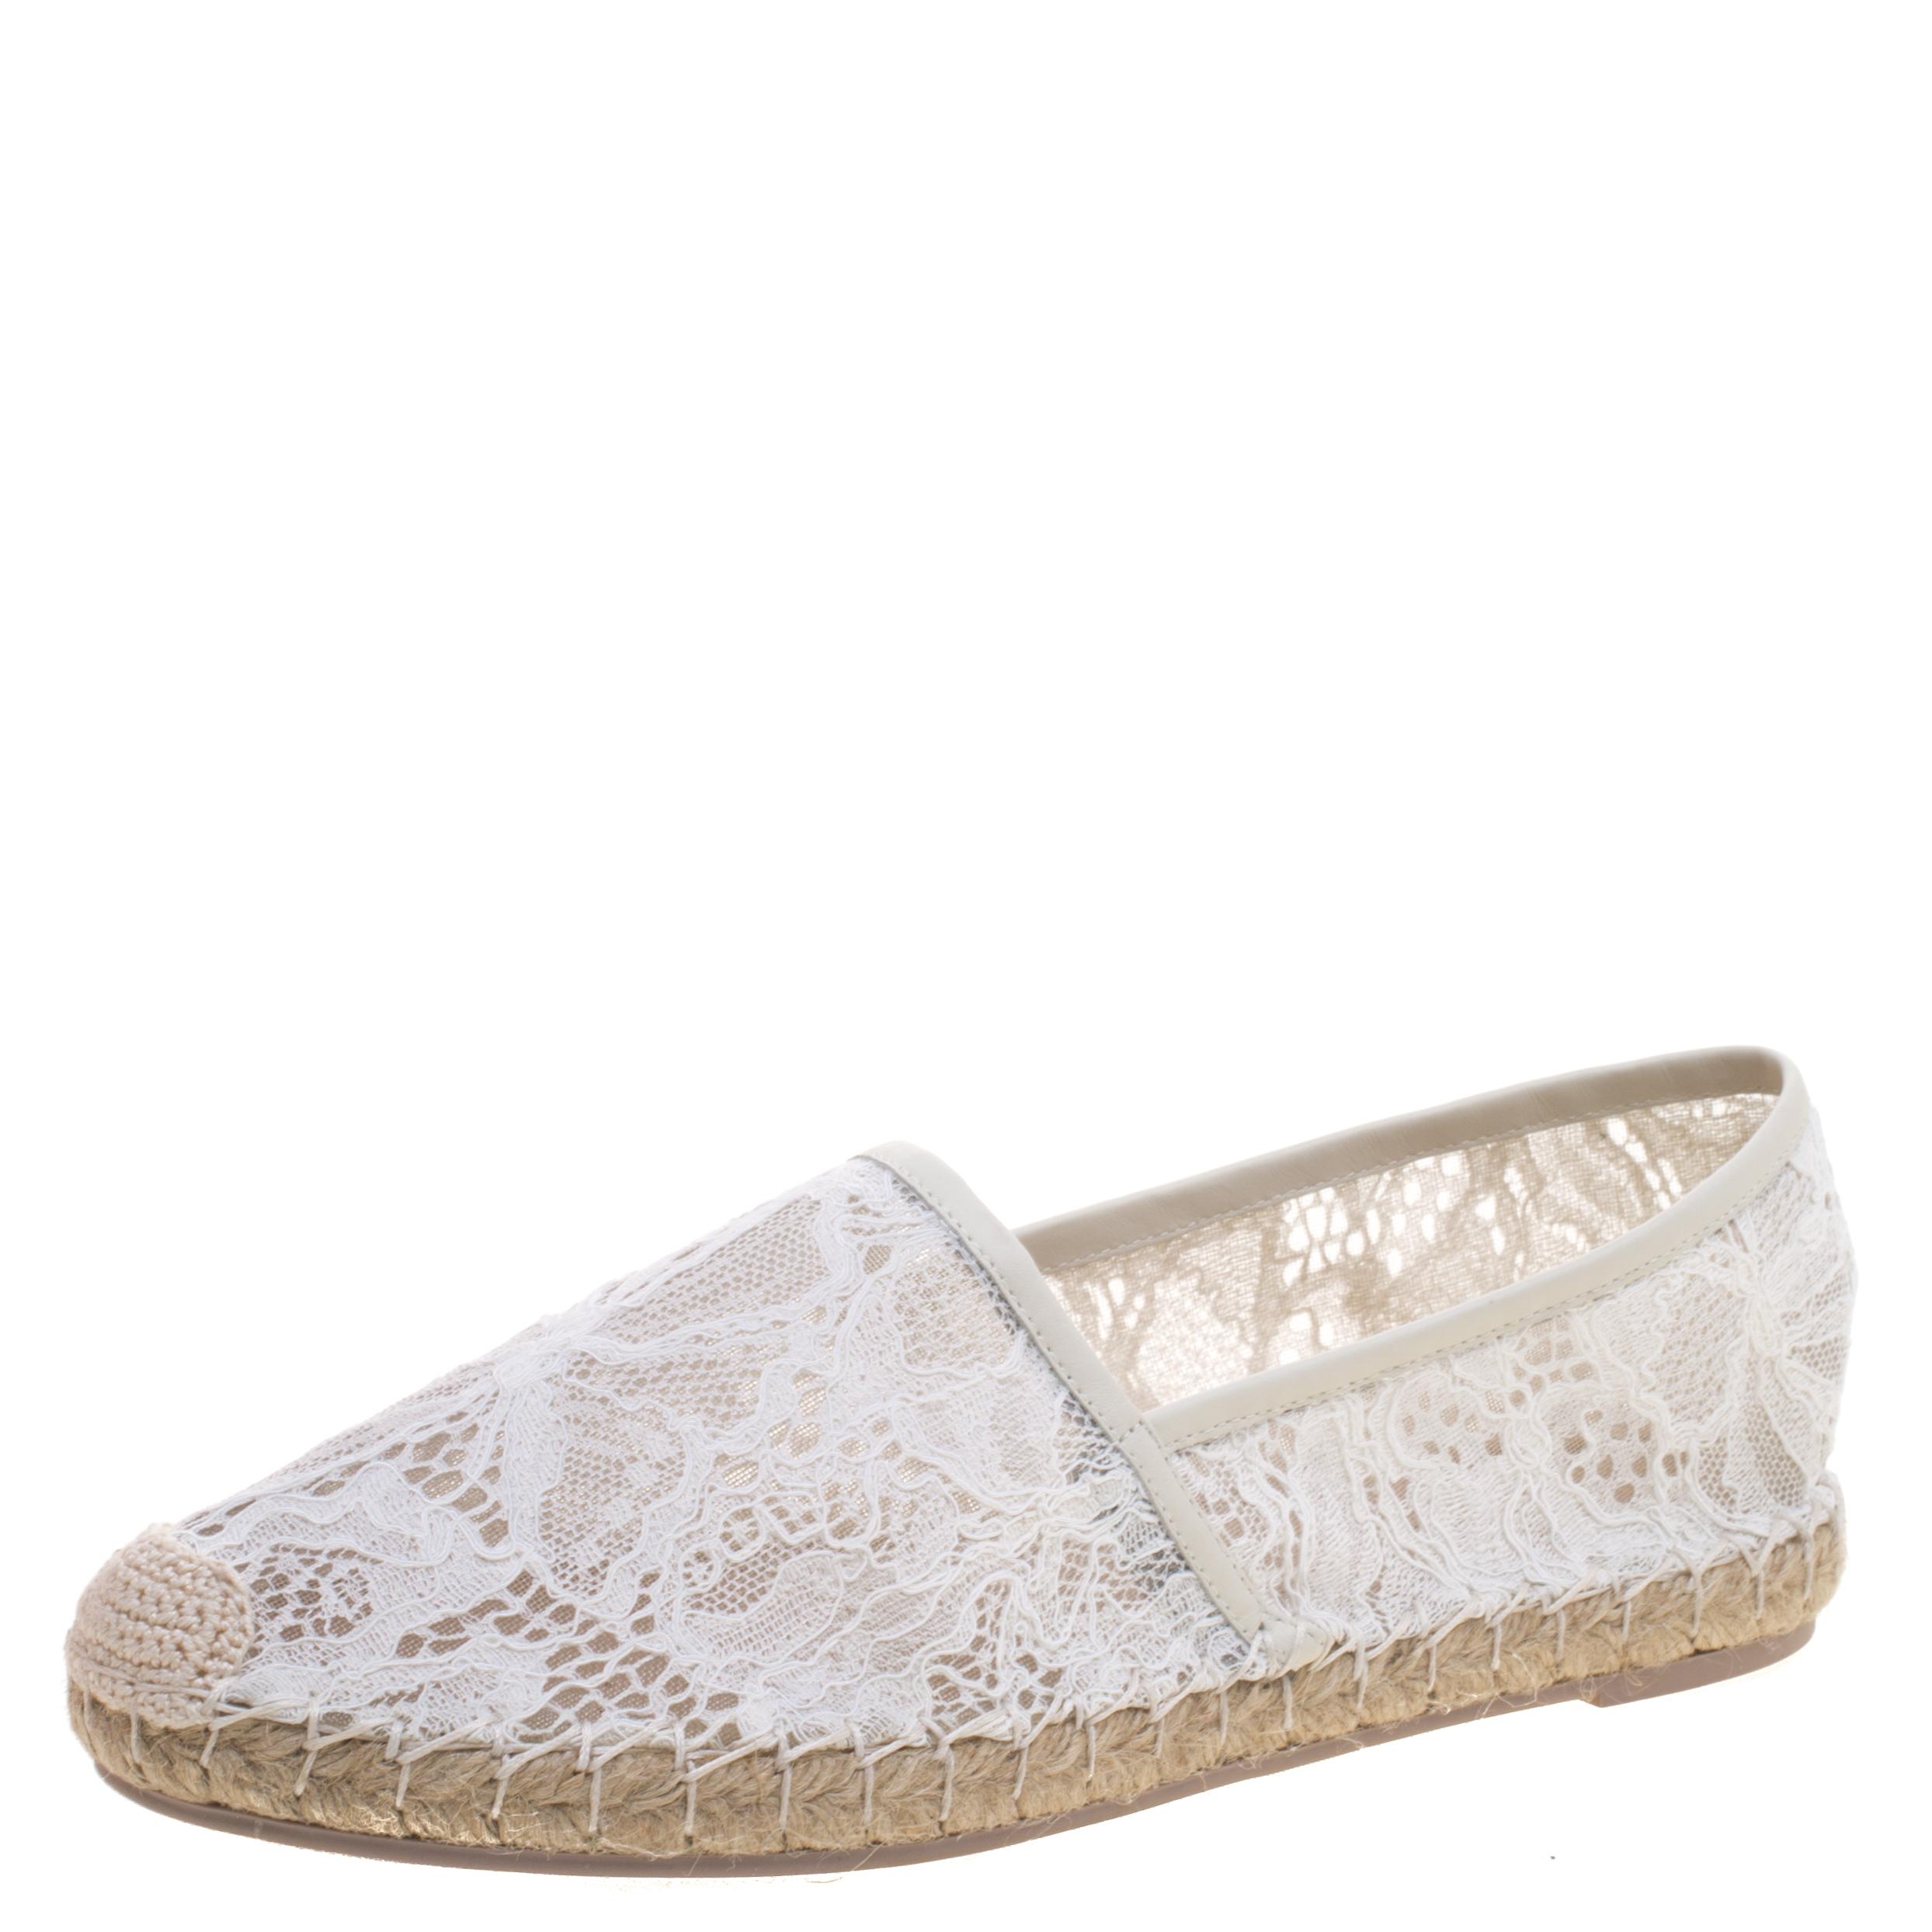 Valentino White Lace Espadrille Flats